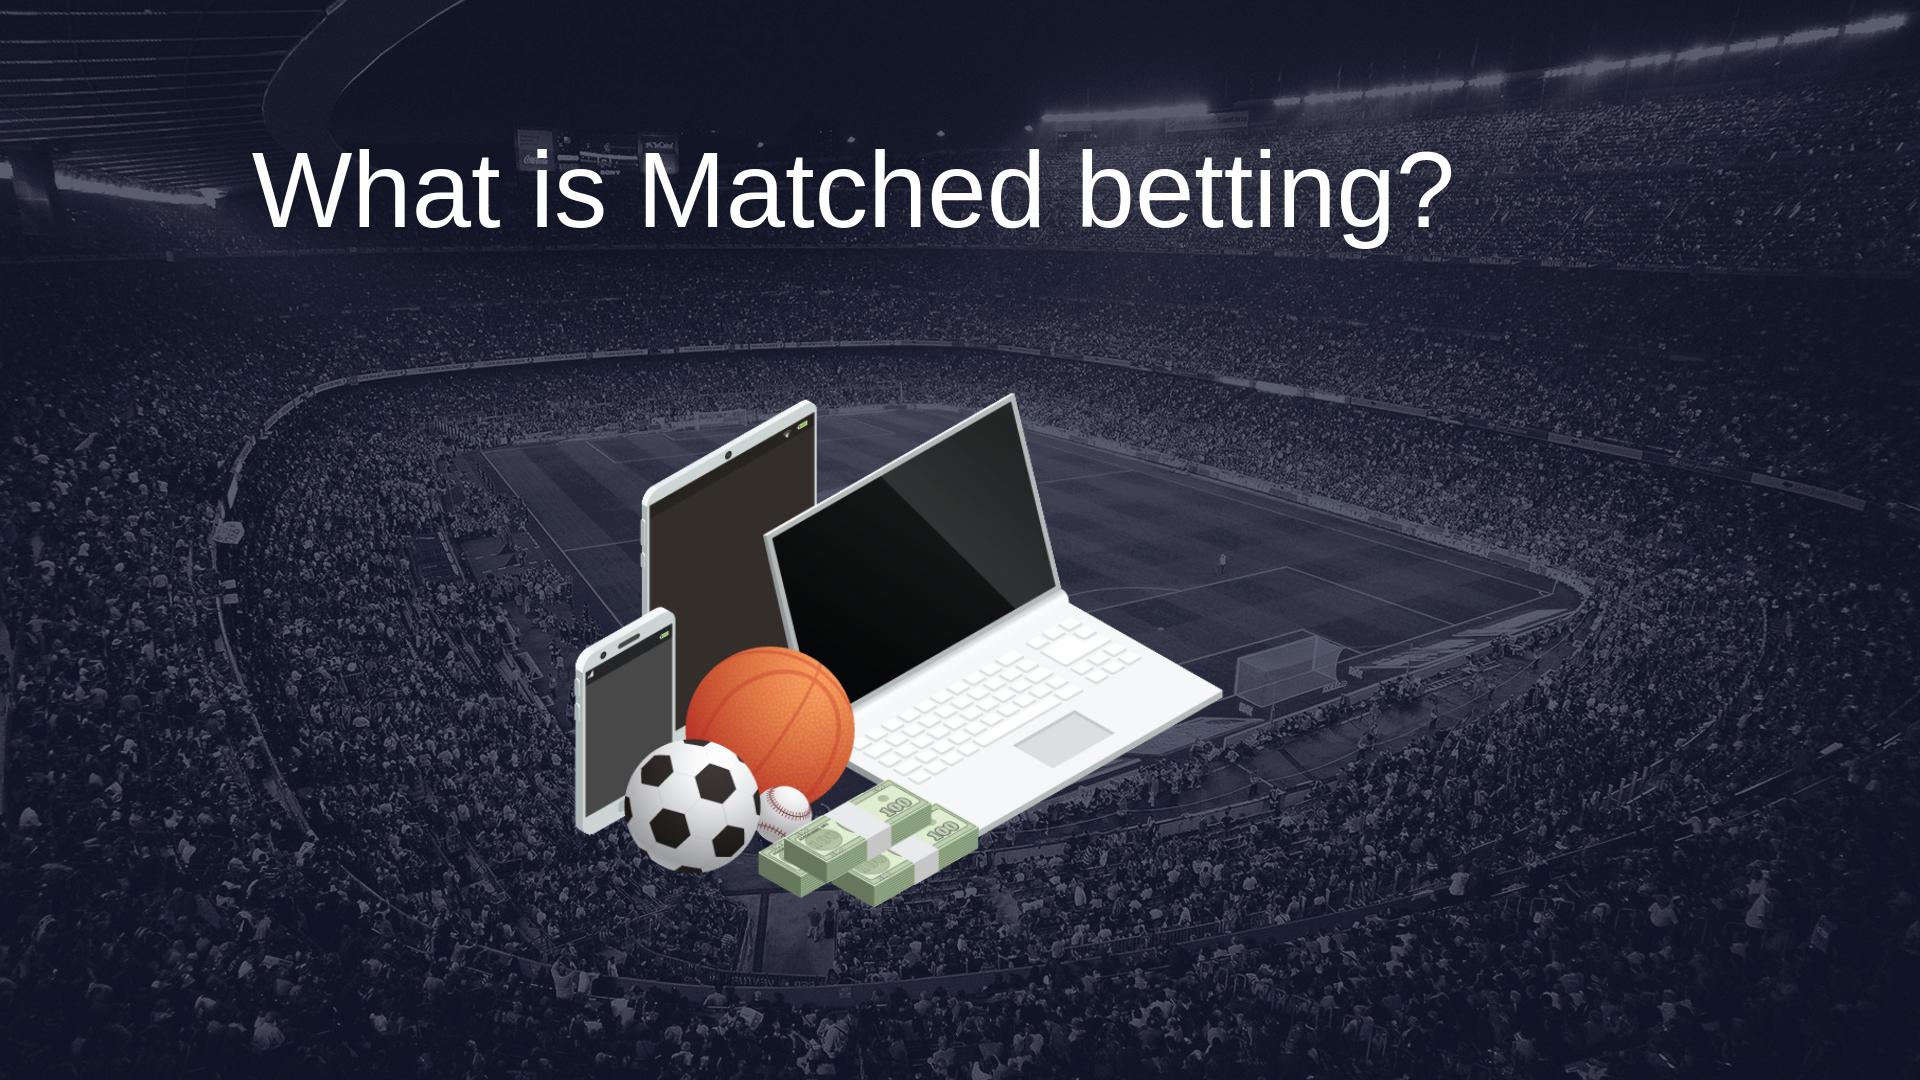 Matched betting bet refund advantage mauro betting atletico mineiro jogos